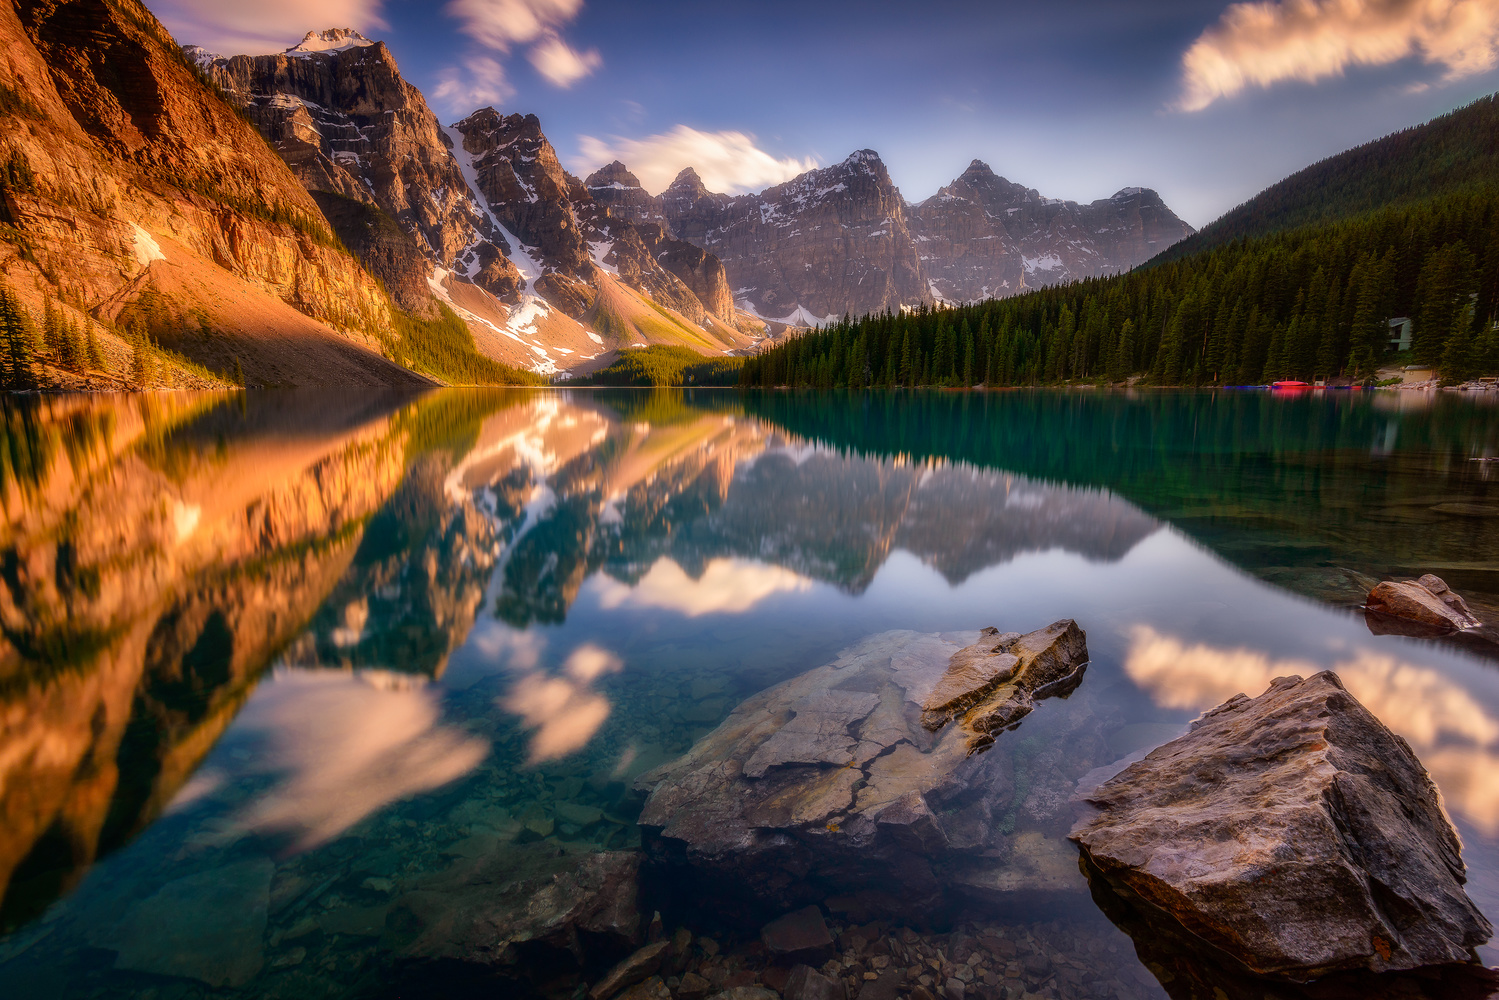 Moraine Lake by Jose Marvin Evasco